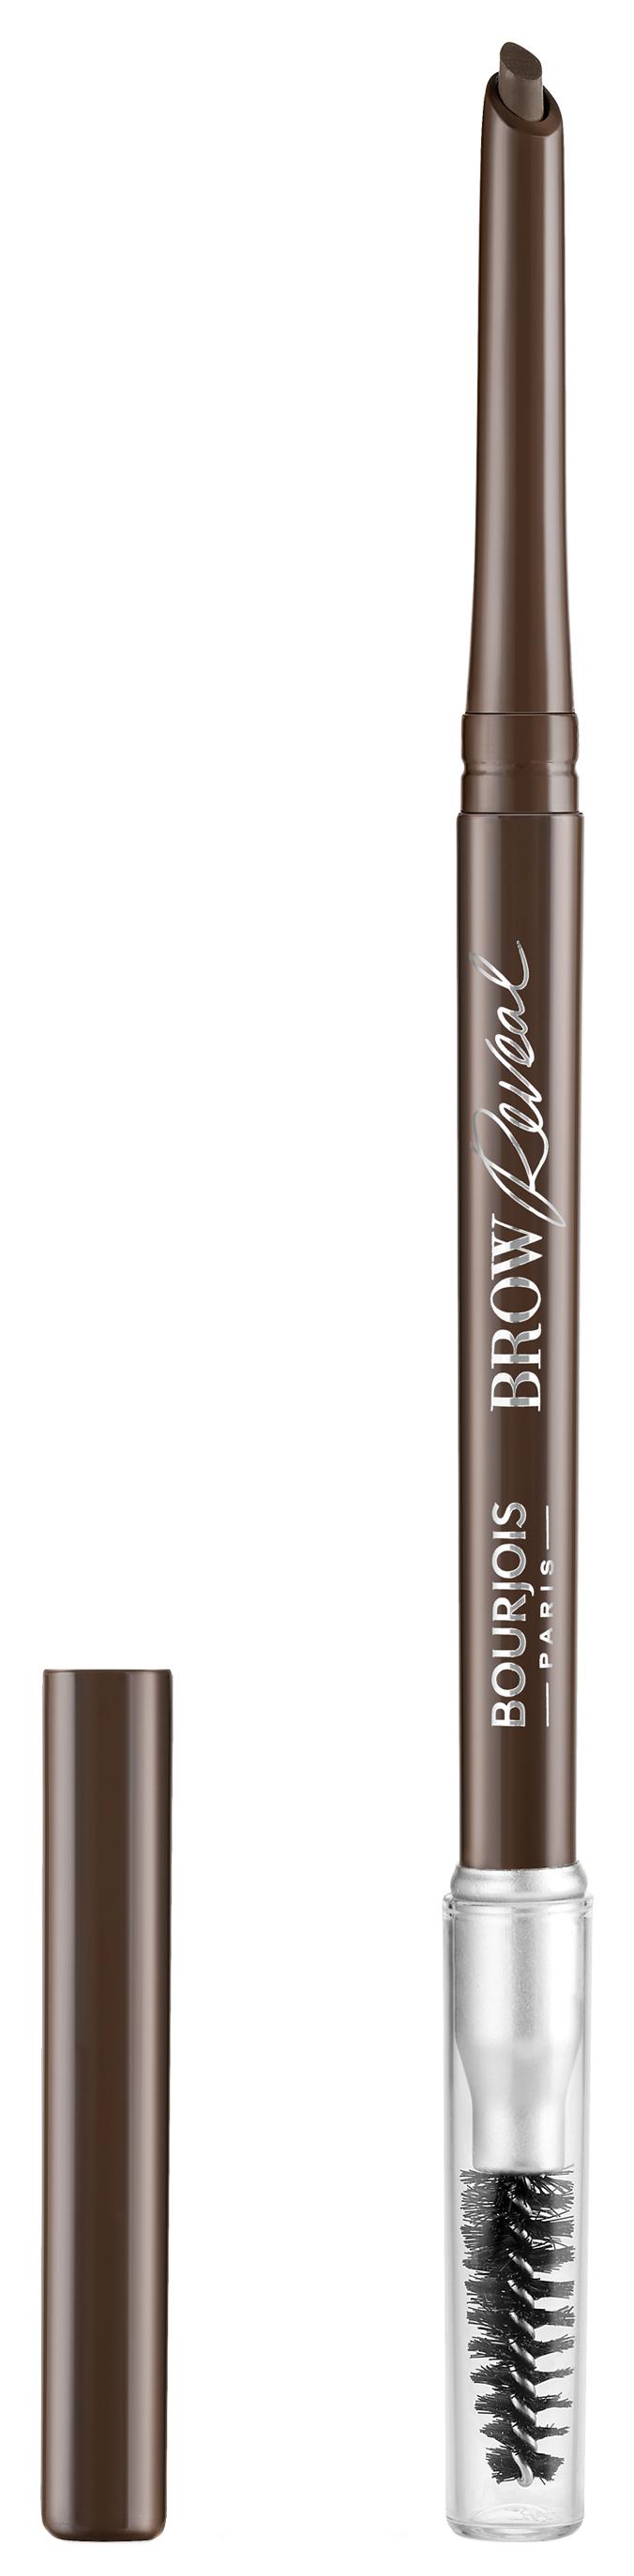 Карандаш для бровей Bourjois Brow Reveal